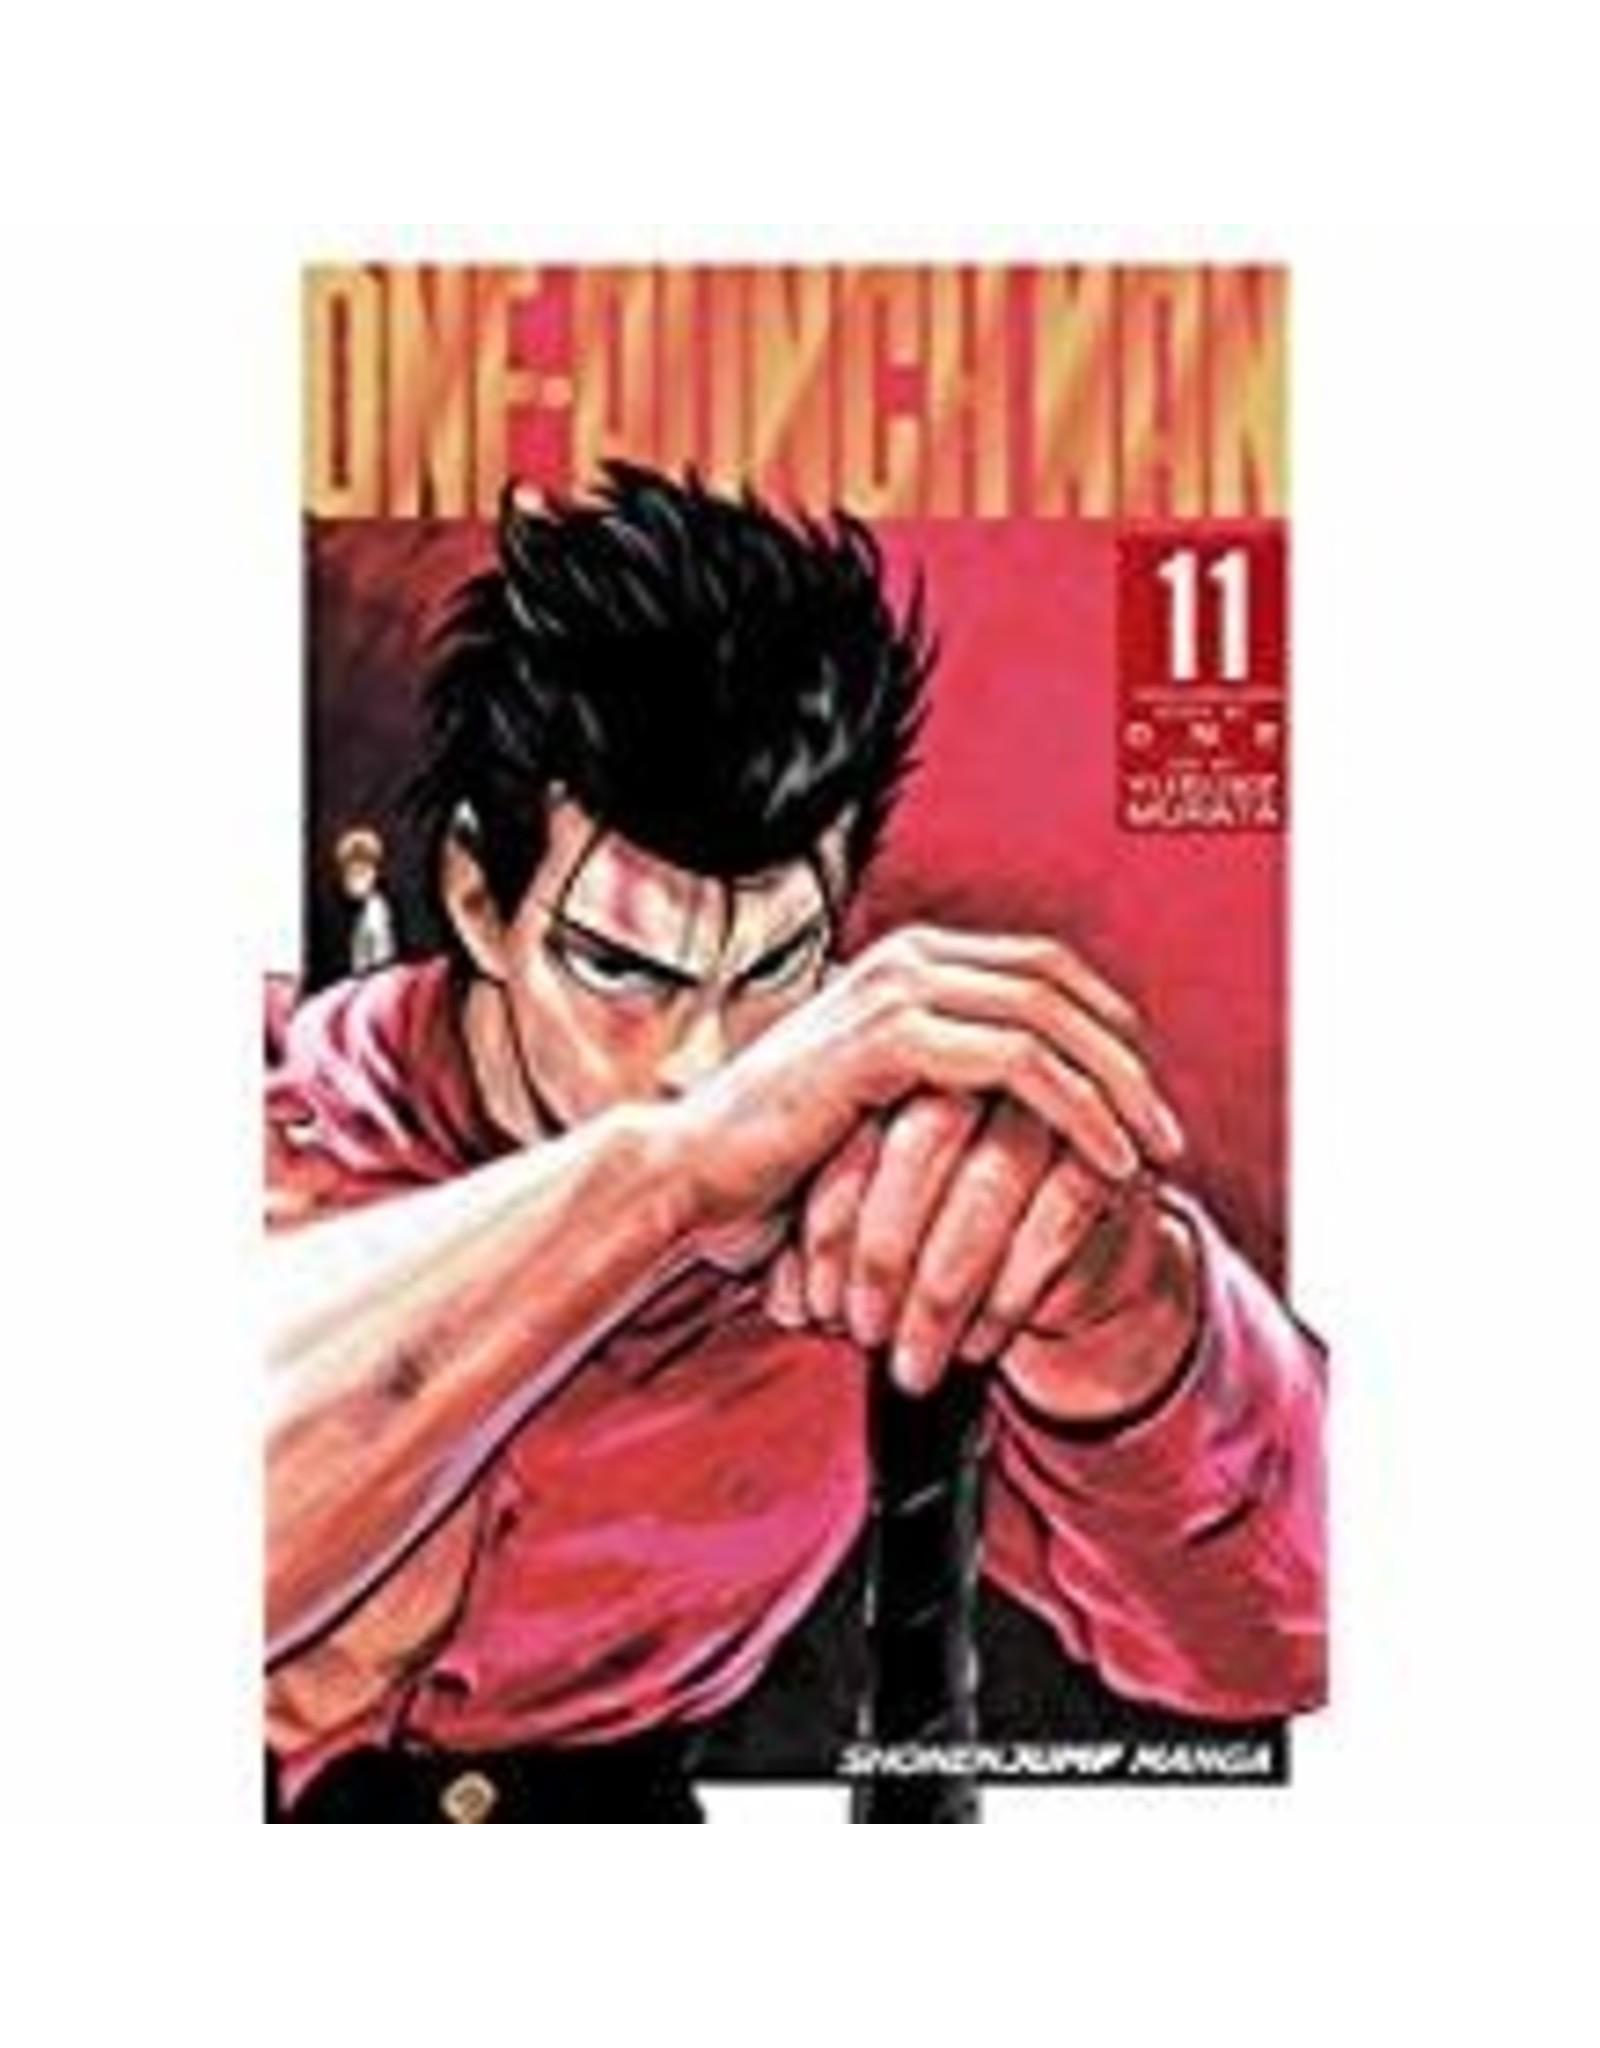 One-Punch Man Volume 11 (English Version)